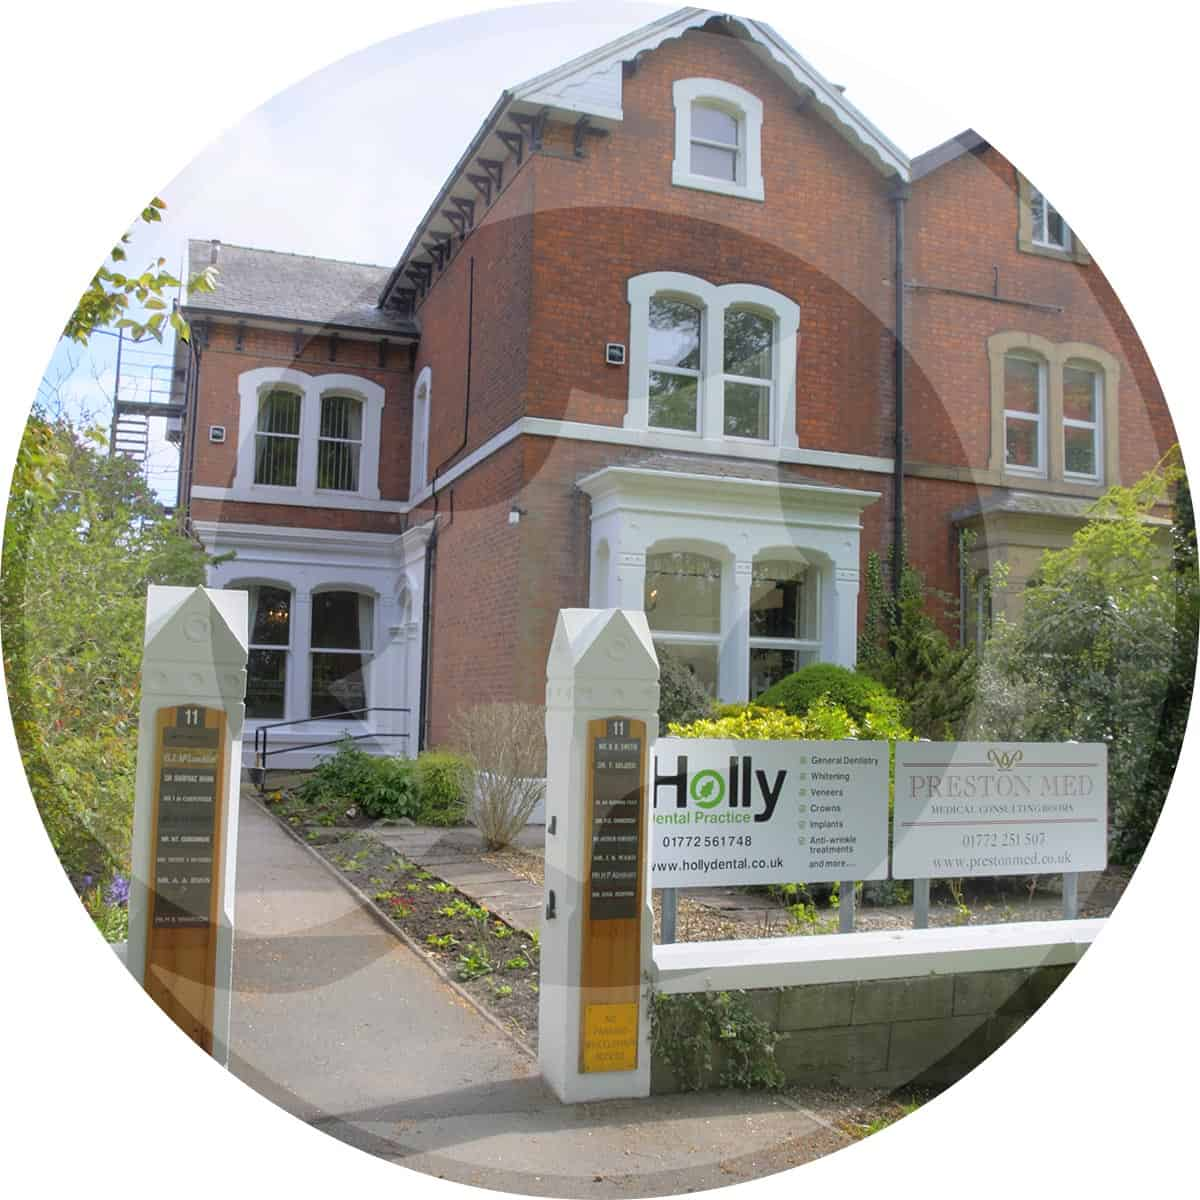 Holly Dental Practice exterior building photograph